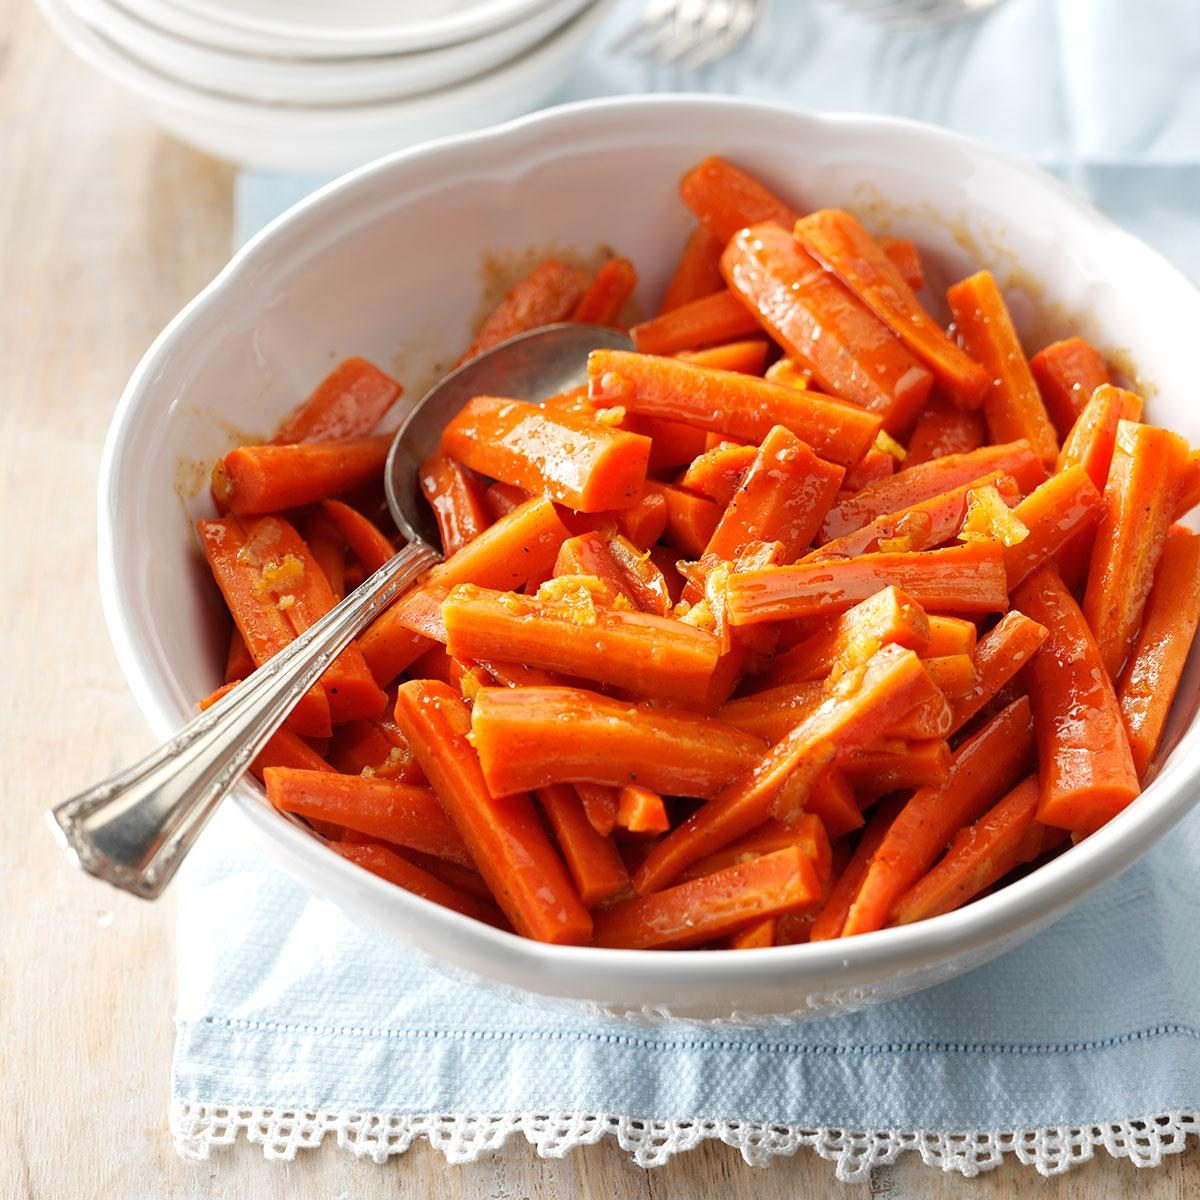 Marmalade-Glazed Carrots